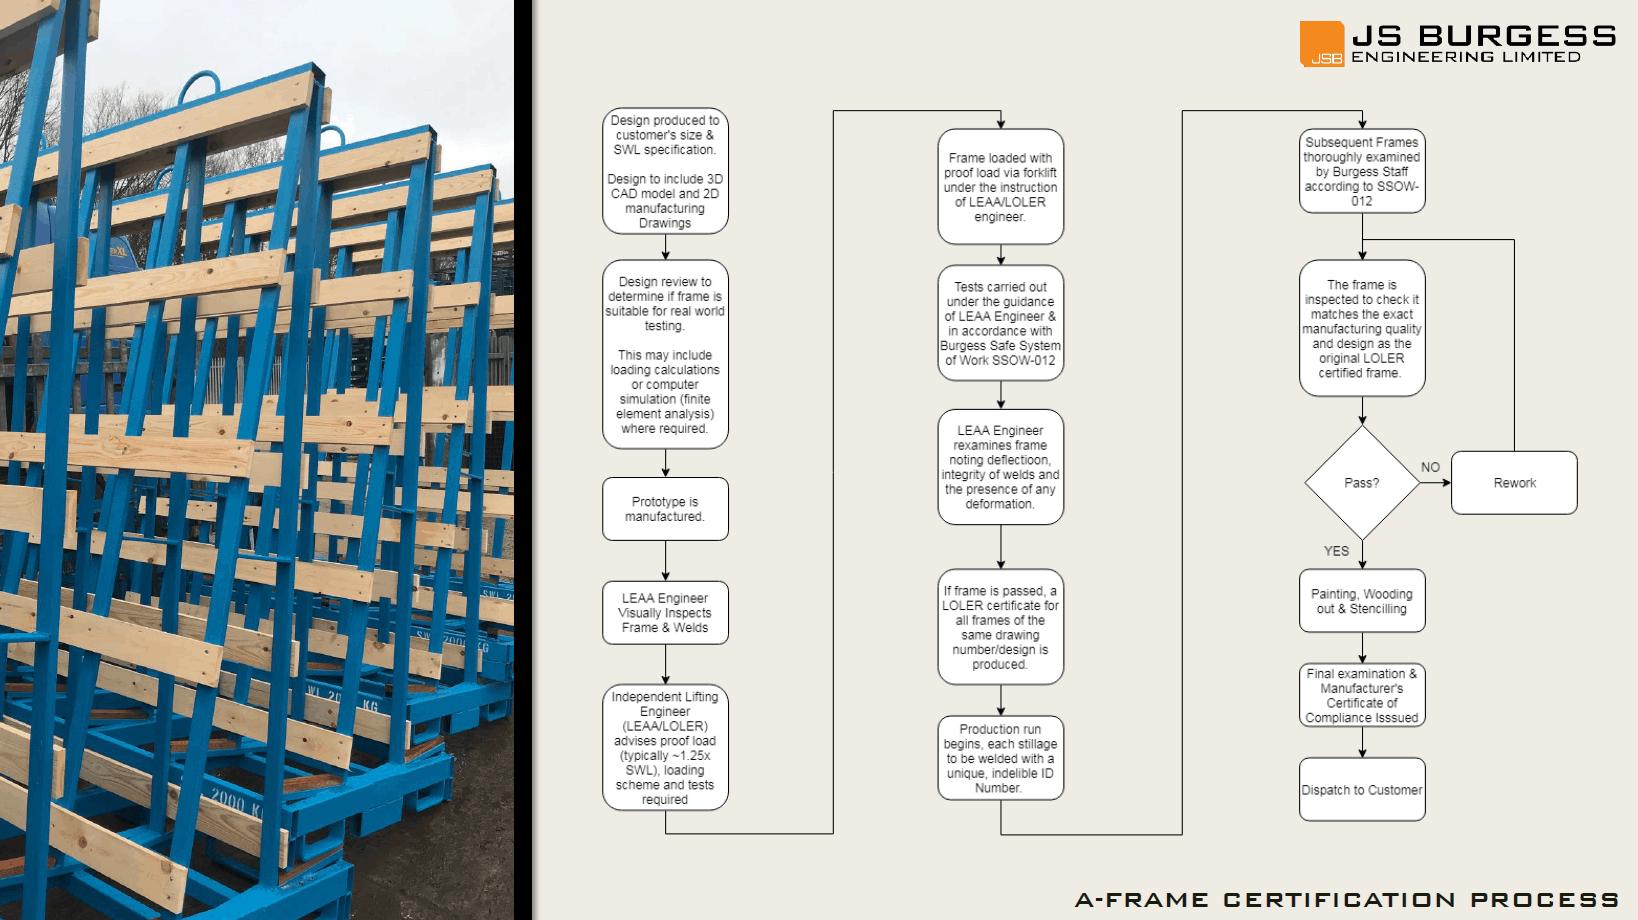 A-frame Certification Process 2